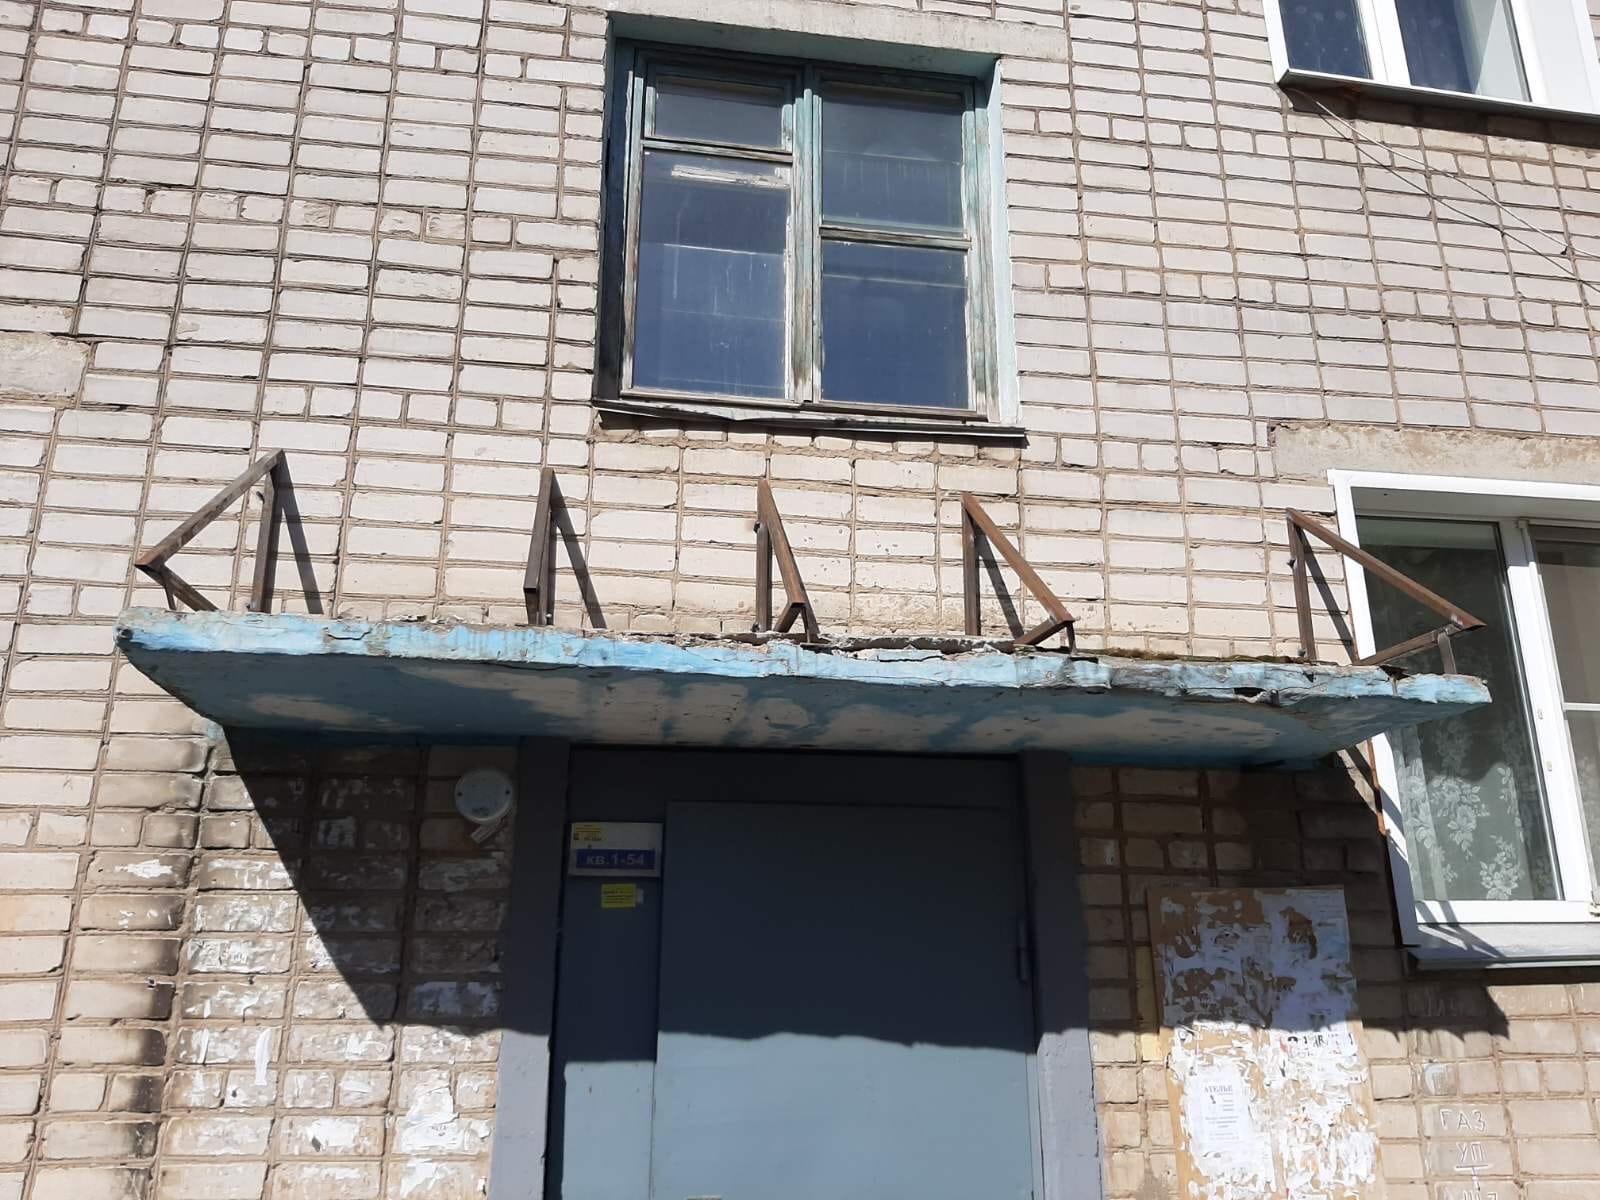 Улица Менделеева дом 7. Устройства железного каркаса